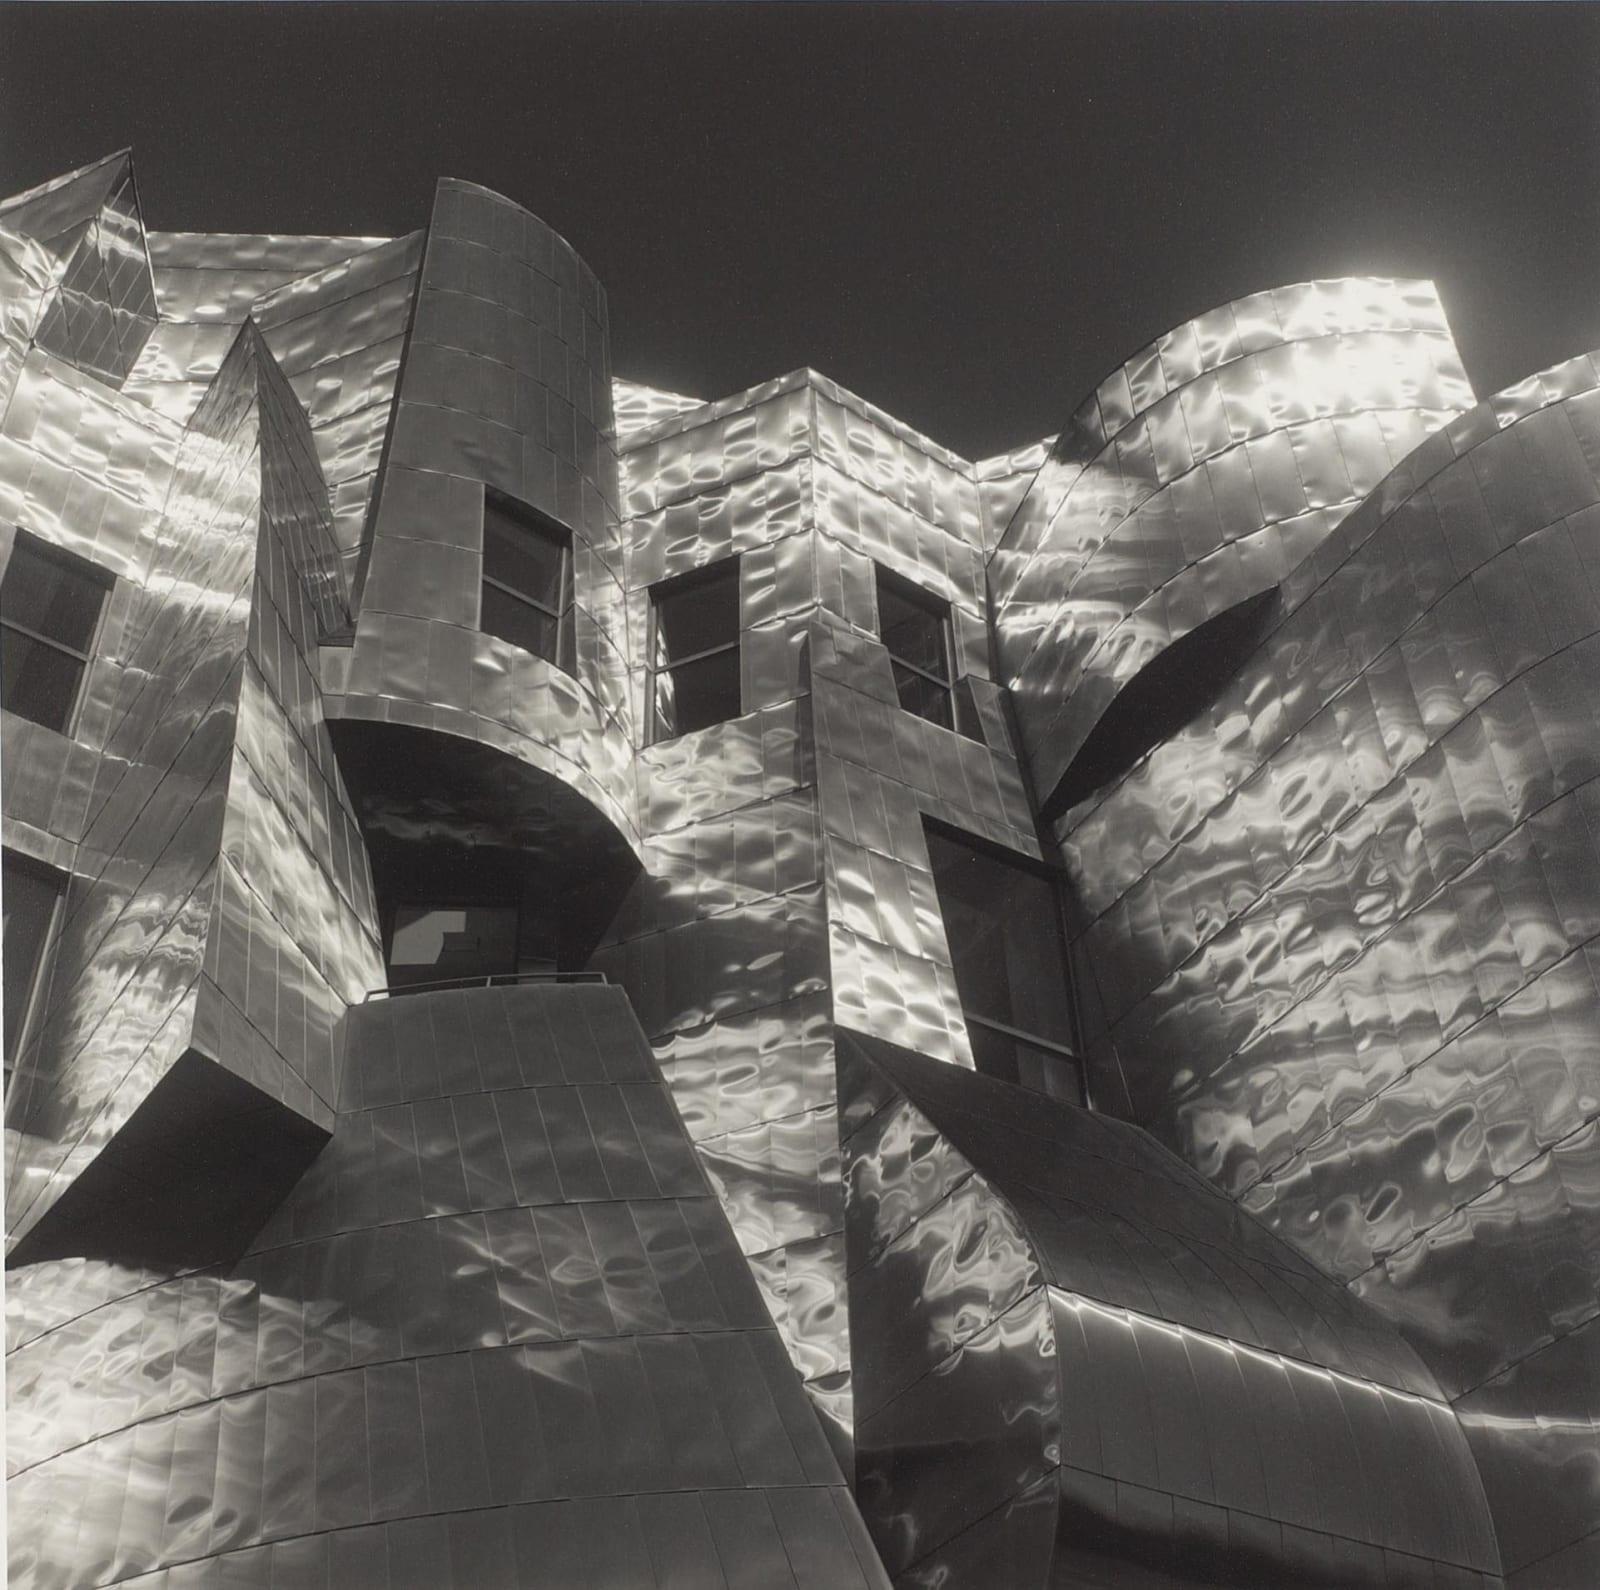 Lynn Davis, Gehry Facade, Minneapolis, MN, 1997